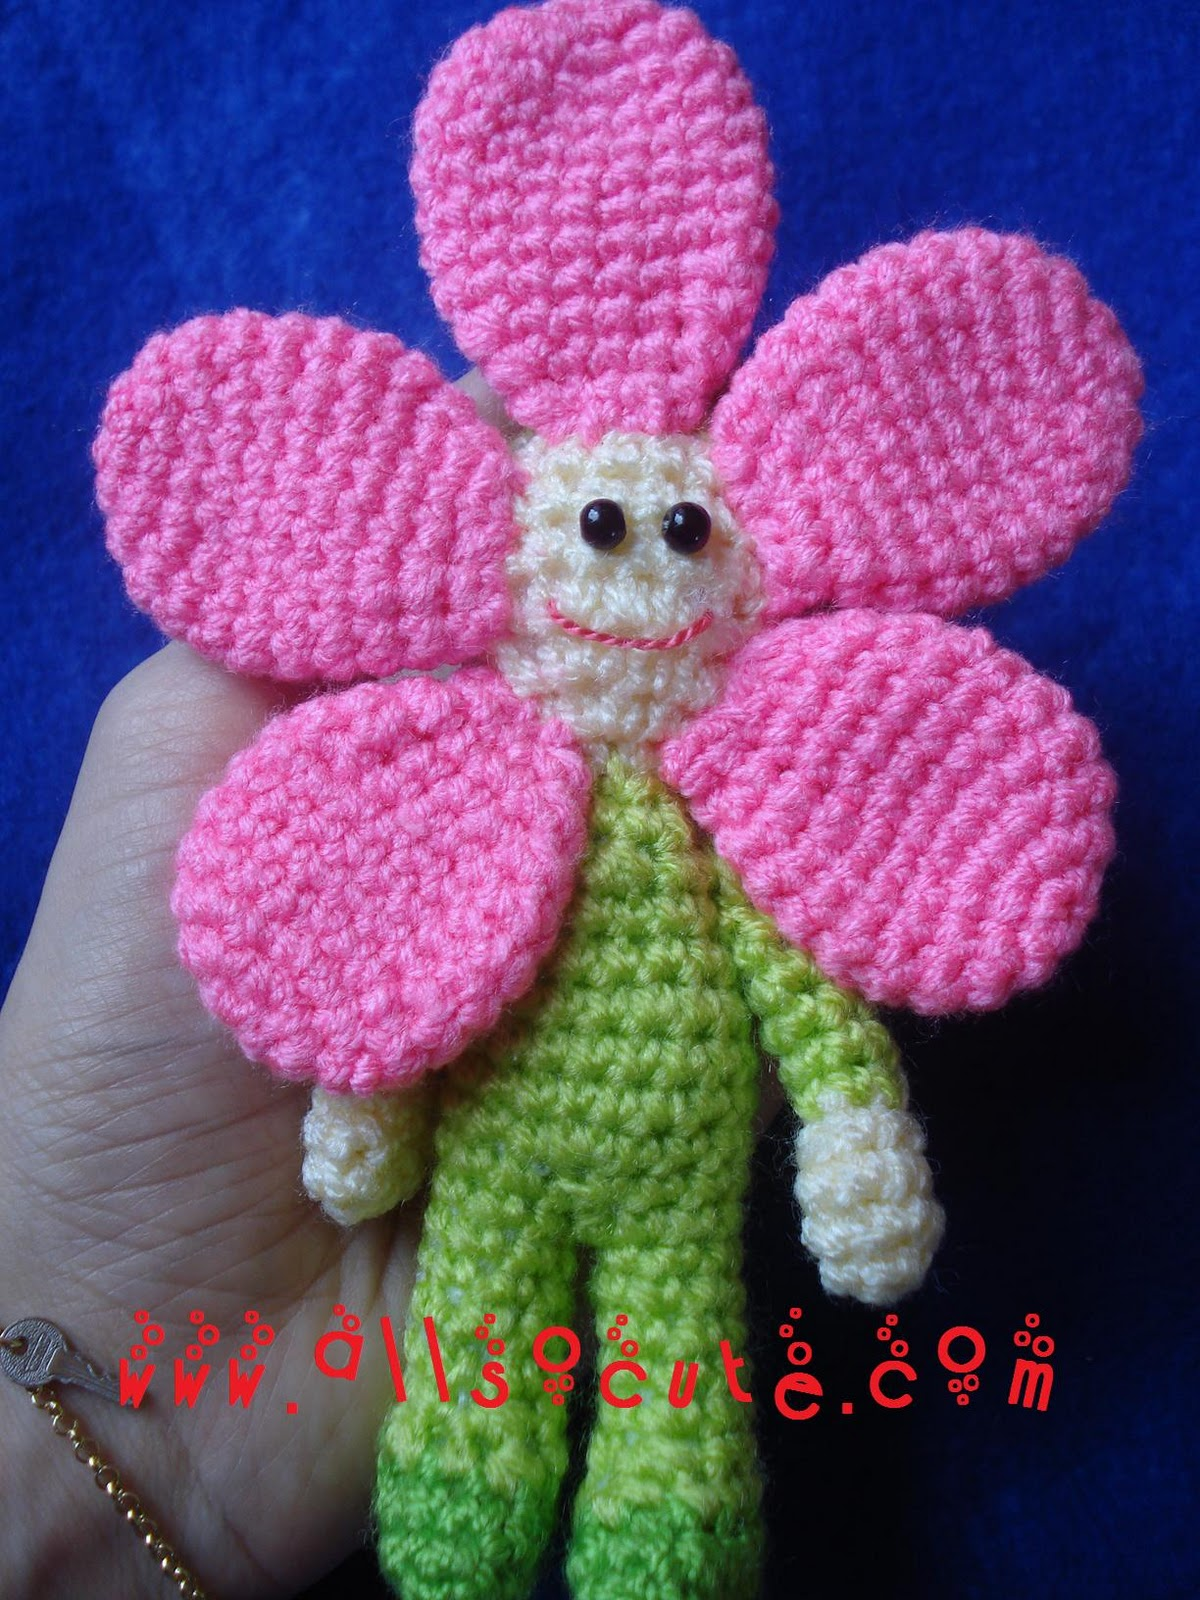 Amigurumi Flower : Allsocute amigurumis flower fairy amigurumi �i�ek perisi